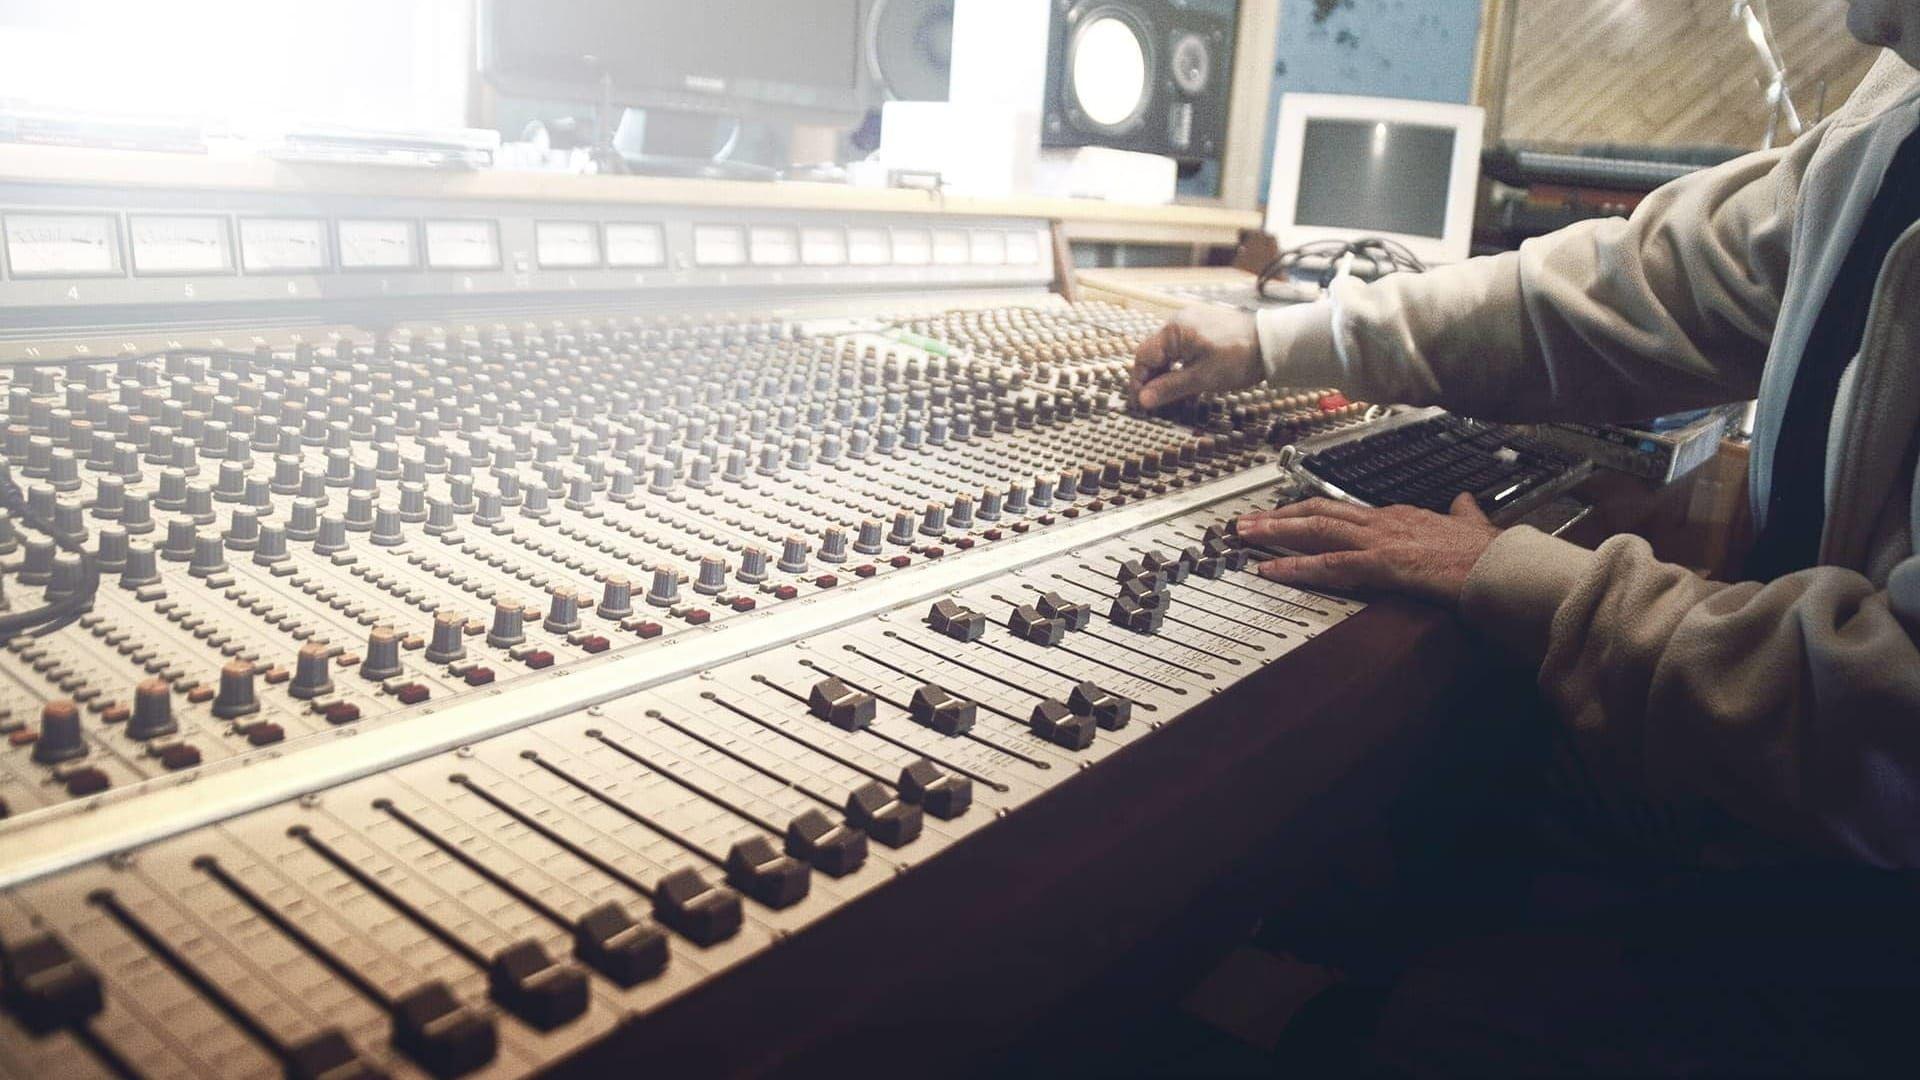 Recording Studio wallpaper and themes